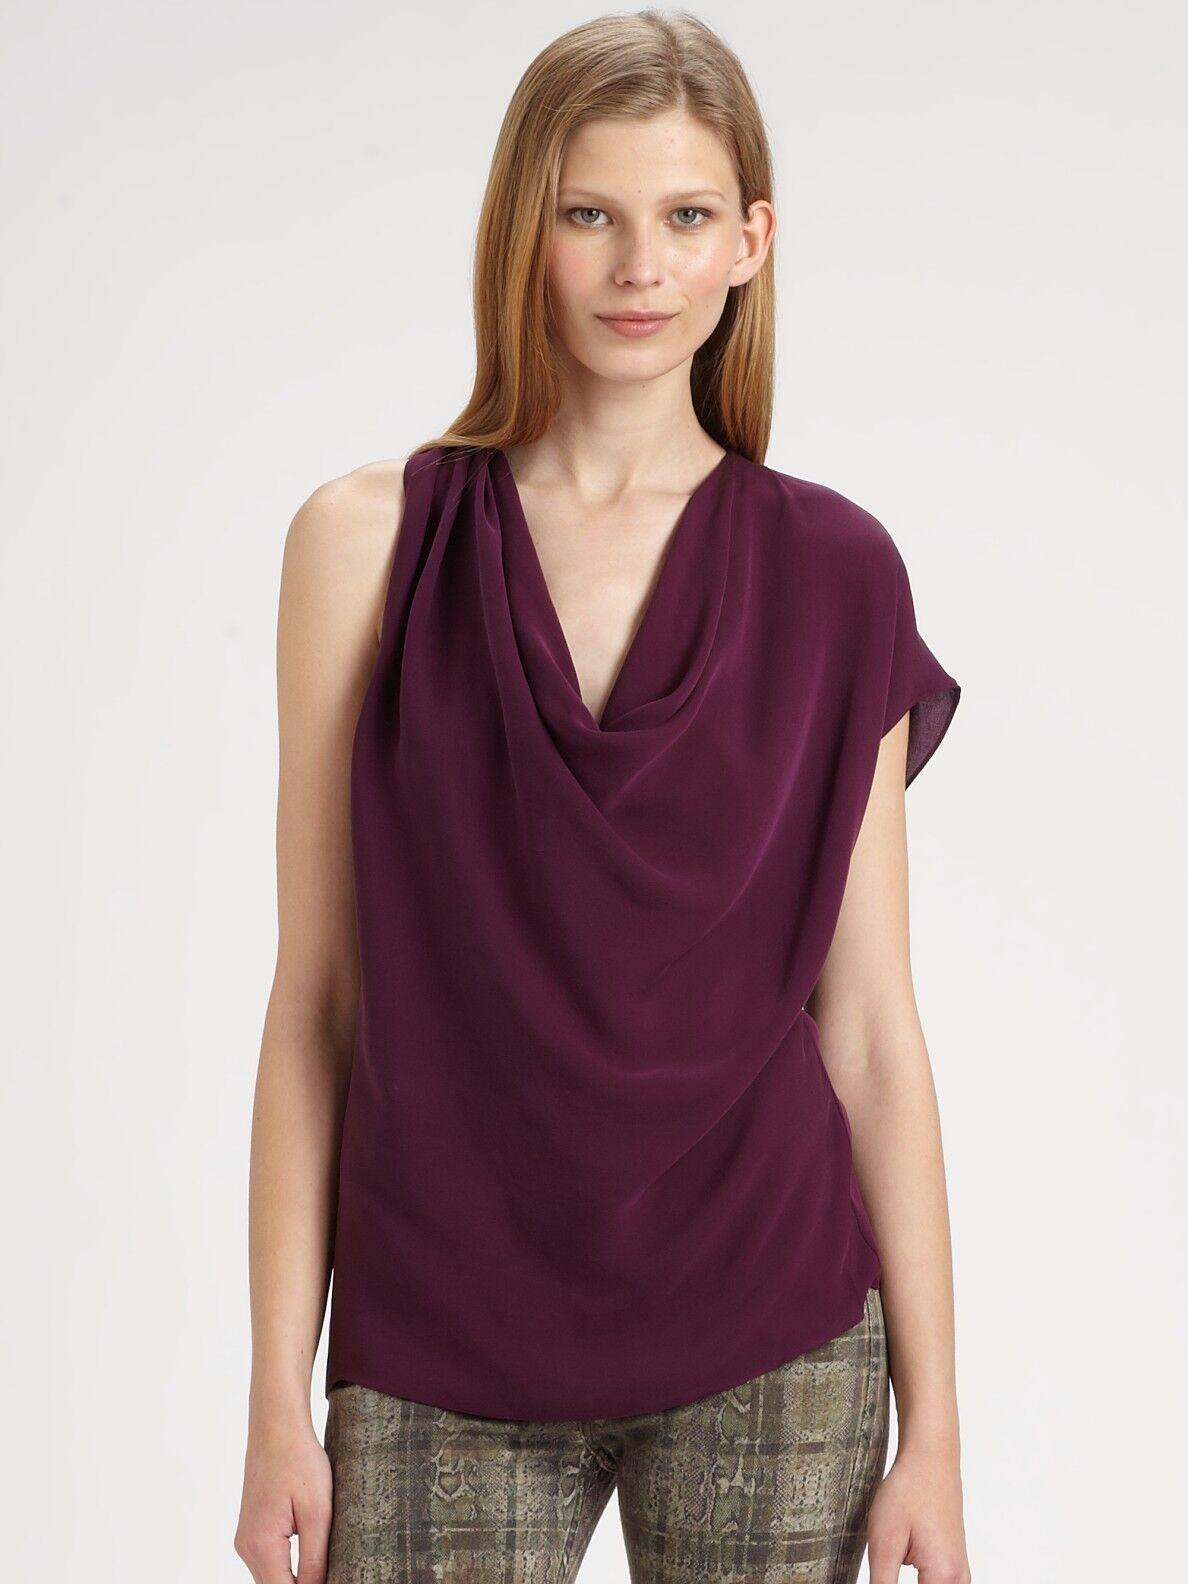 Haute Hippie Cowl Neck Asymmetrical   Silk Blouse Tank Top   Größe  S